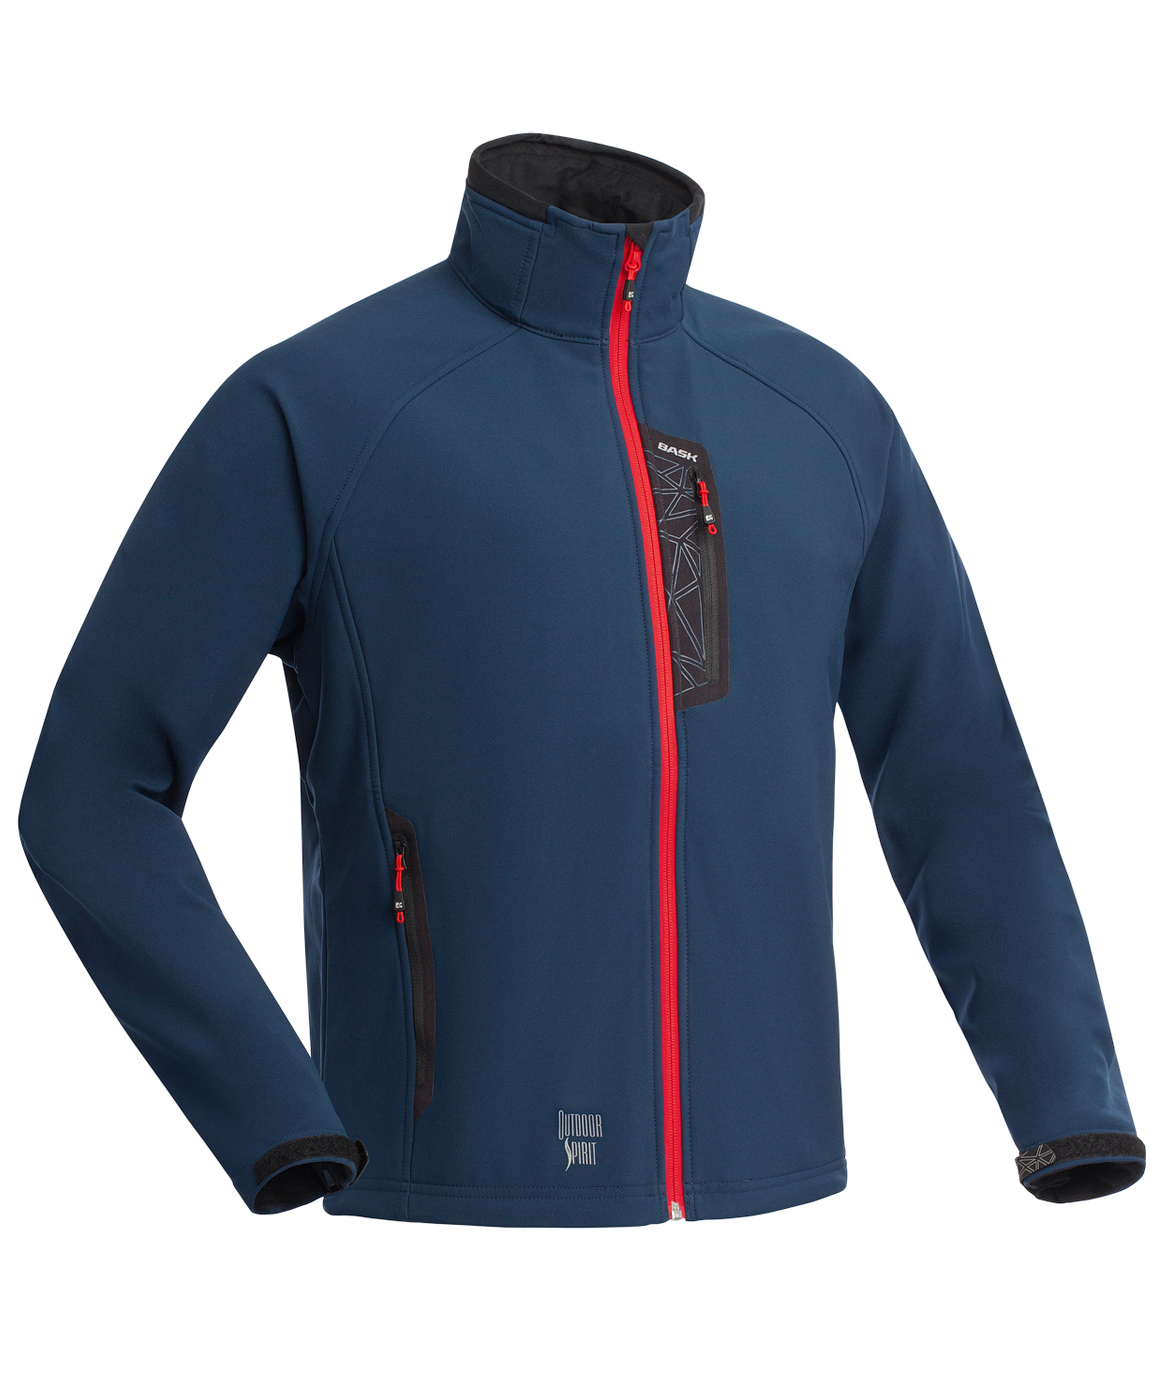 Куртка BASK PANZER V5 темно-синий, Куртки из Polartec и флиса - арт. 994710330